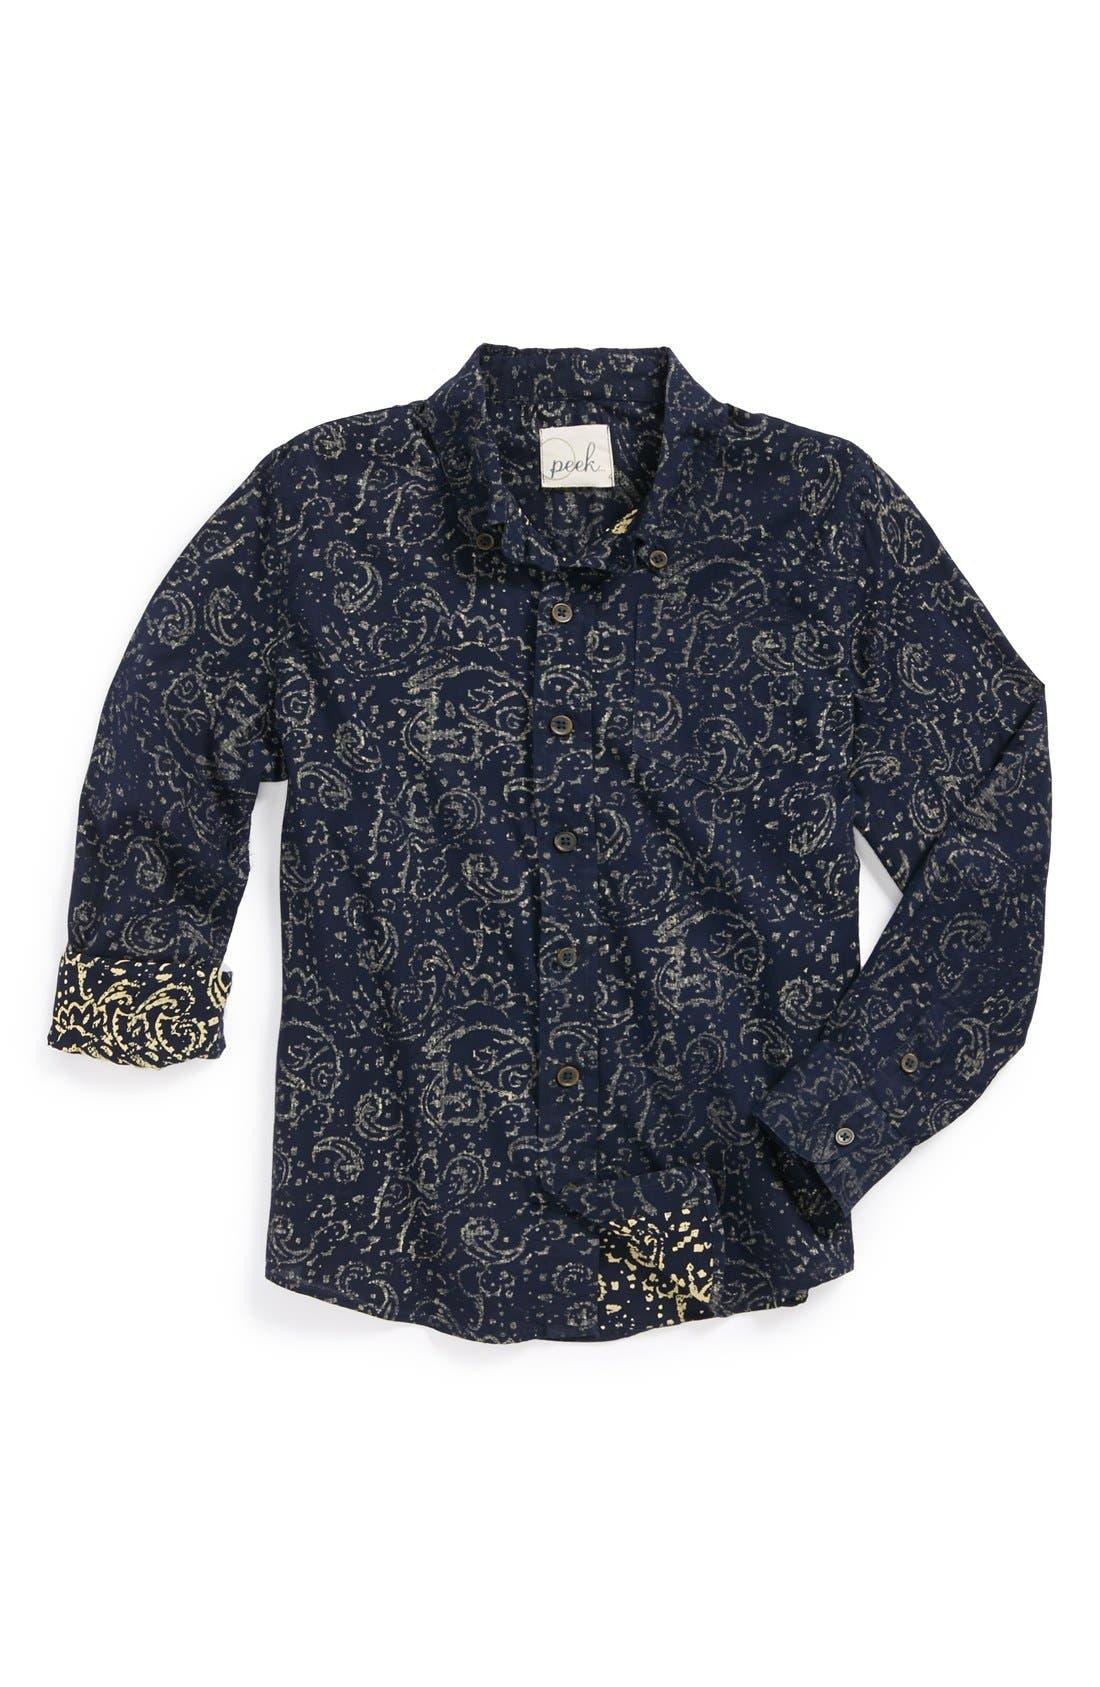 Main Image - Peek 'Paisley' Woven Shirt (Big Boys)